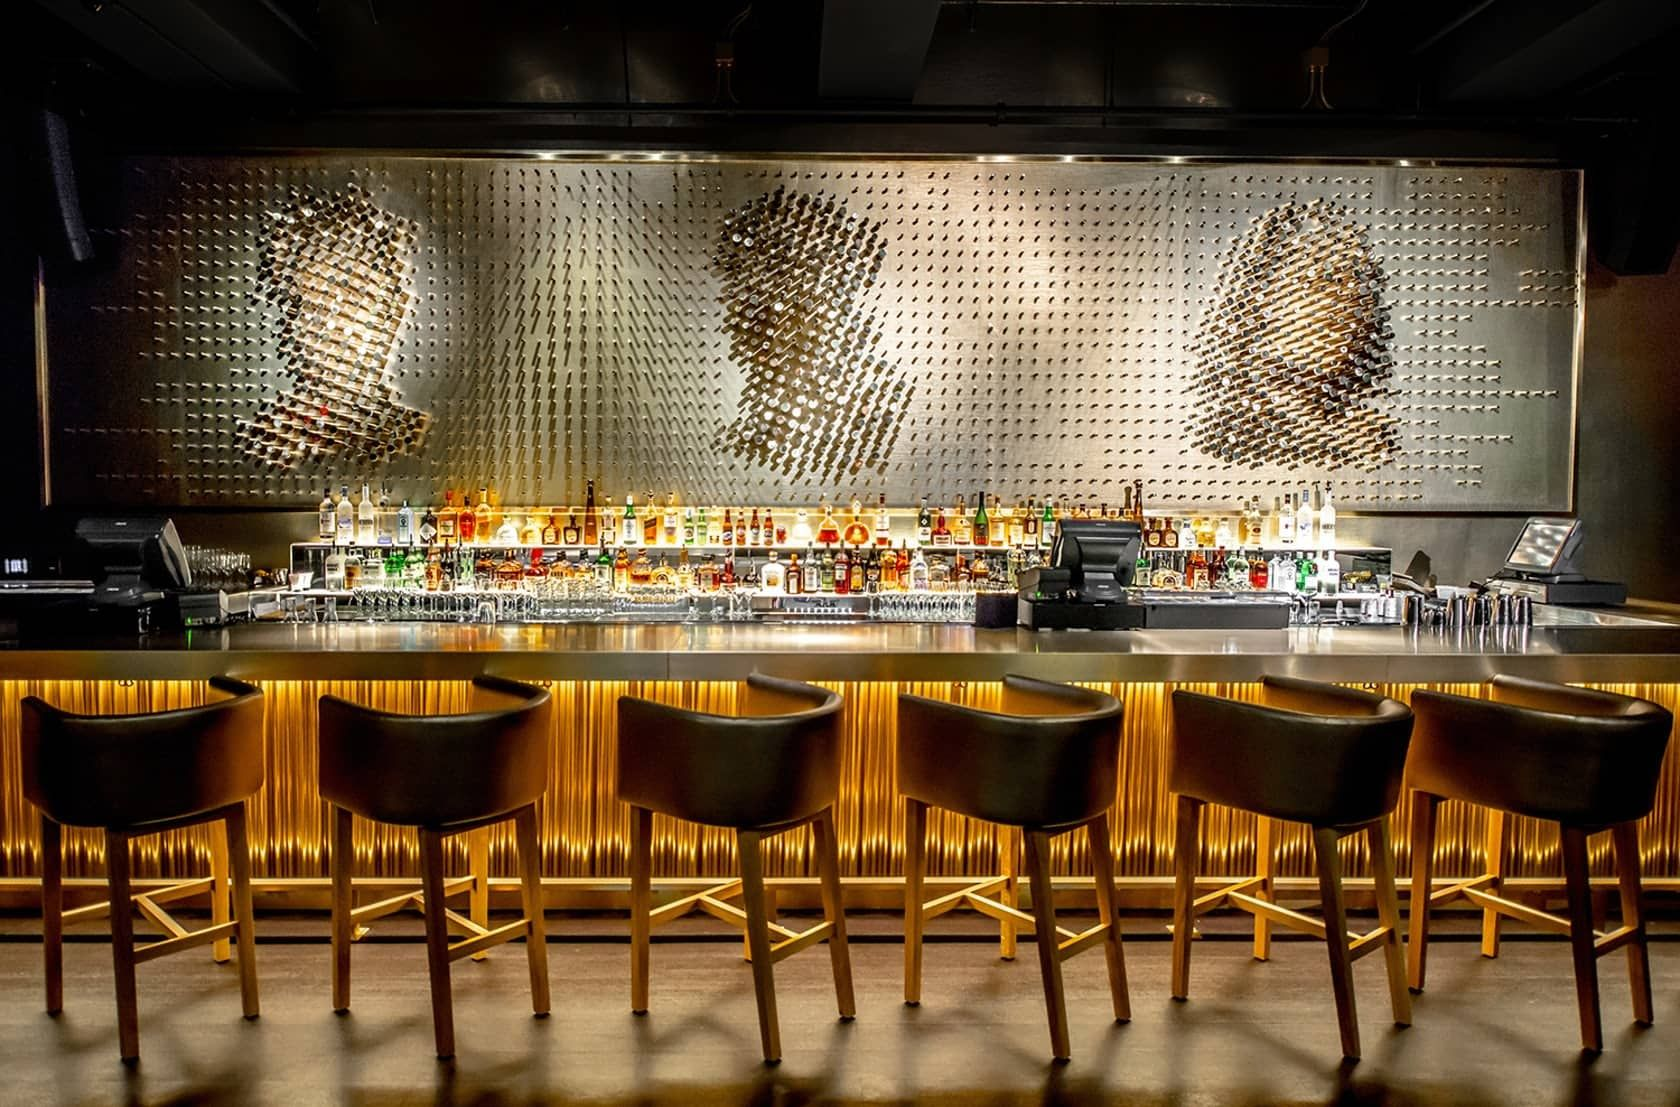 Giant Brass Pegs By Nema Workshop At Pov Washington Bar Wall Design Restaurant Interior Design Metal Restaurant